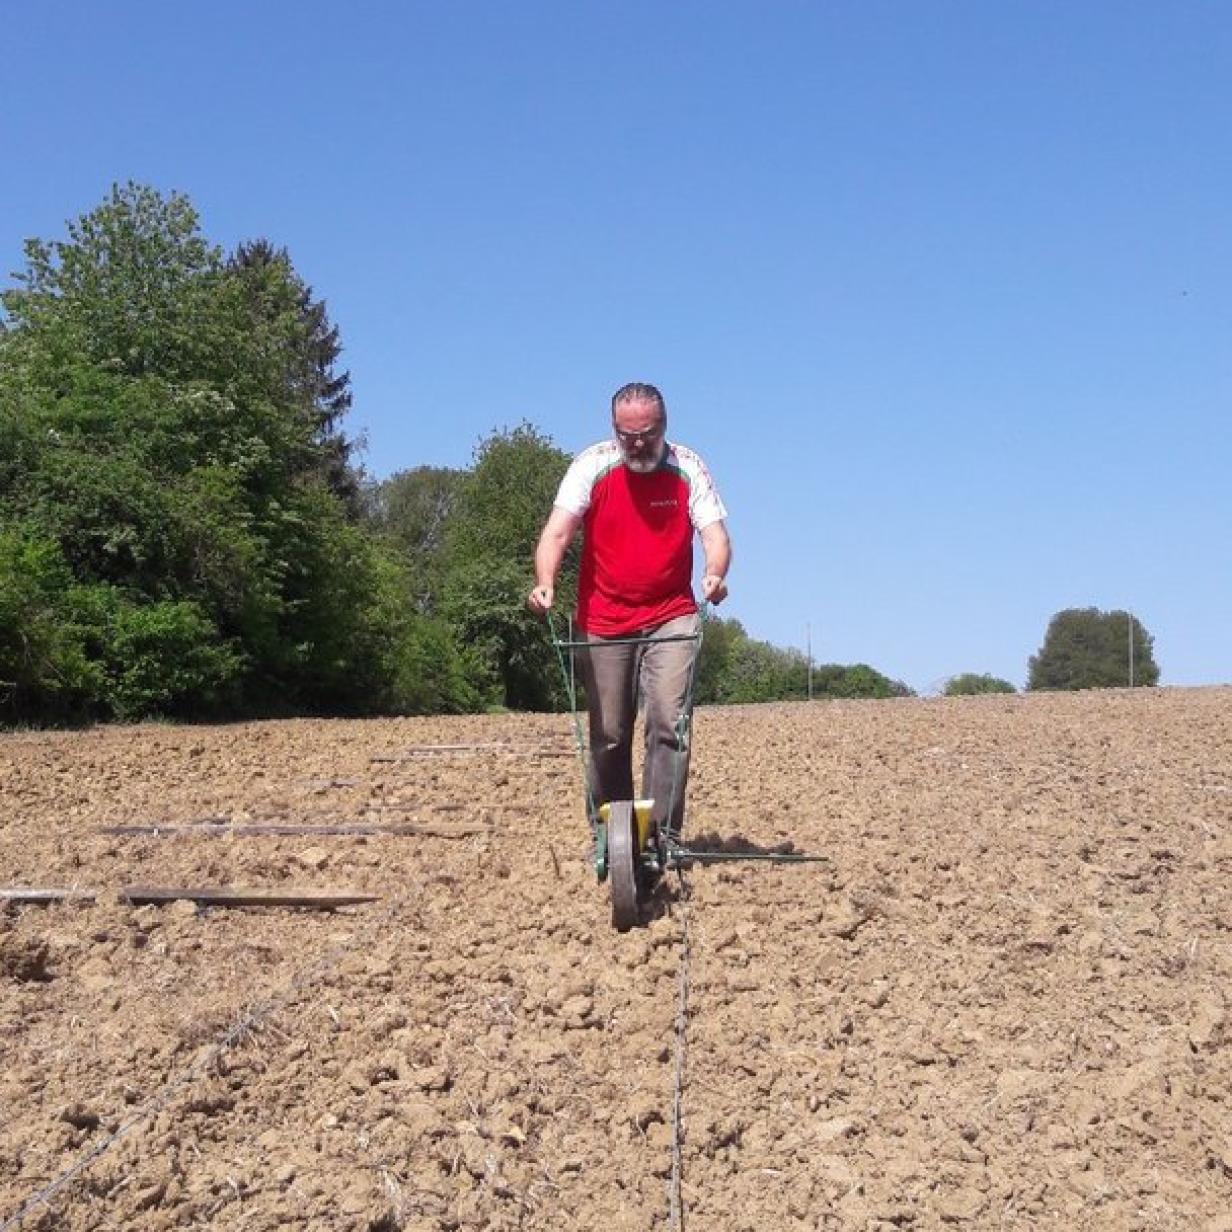 Gablitz: Trotz eigener Gärten wird Gemüse am Feld angebaut